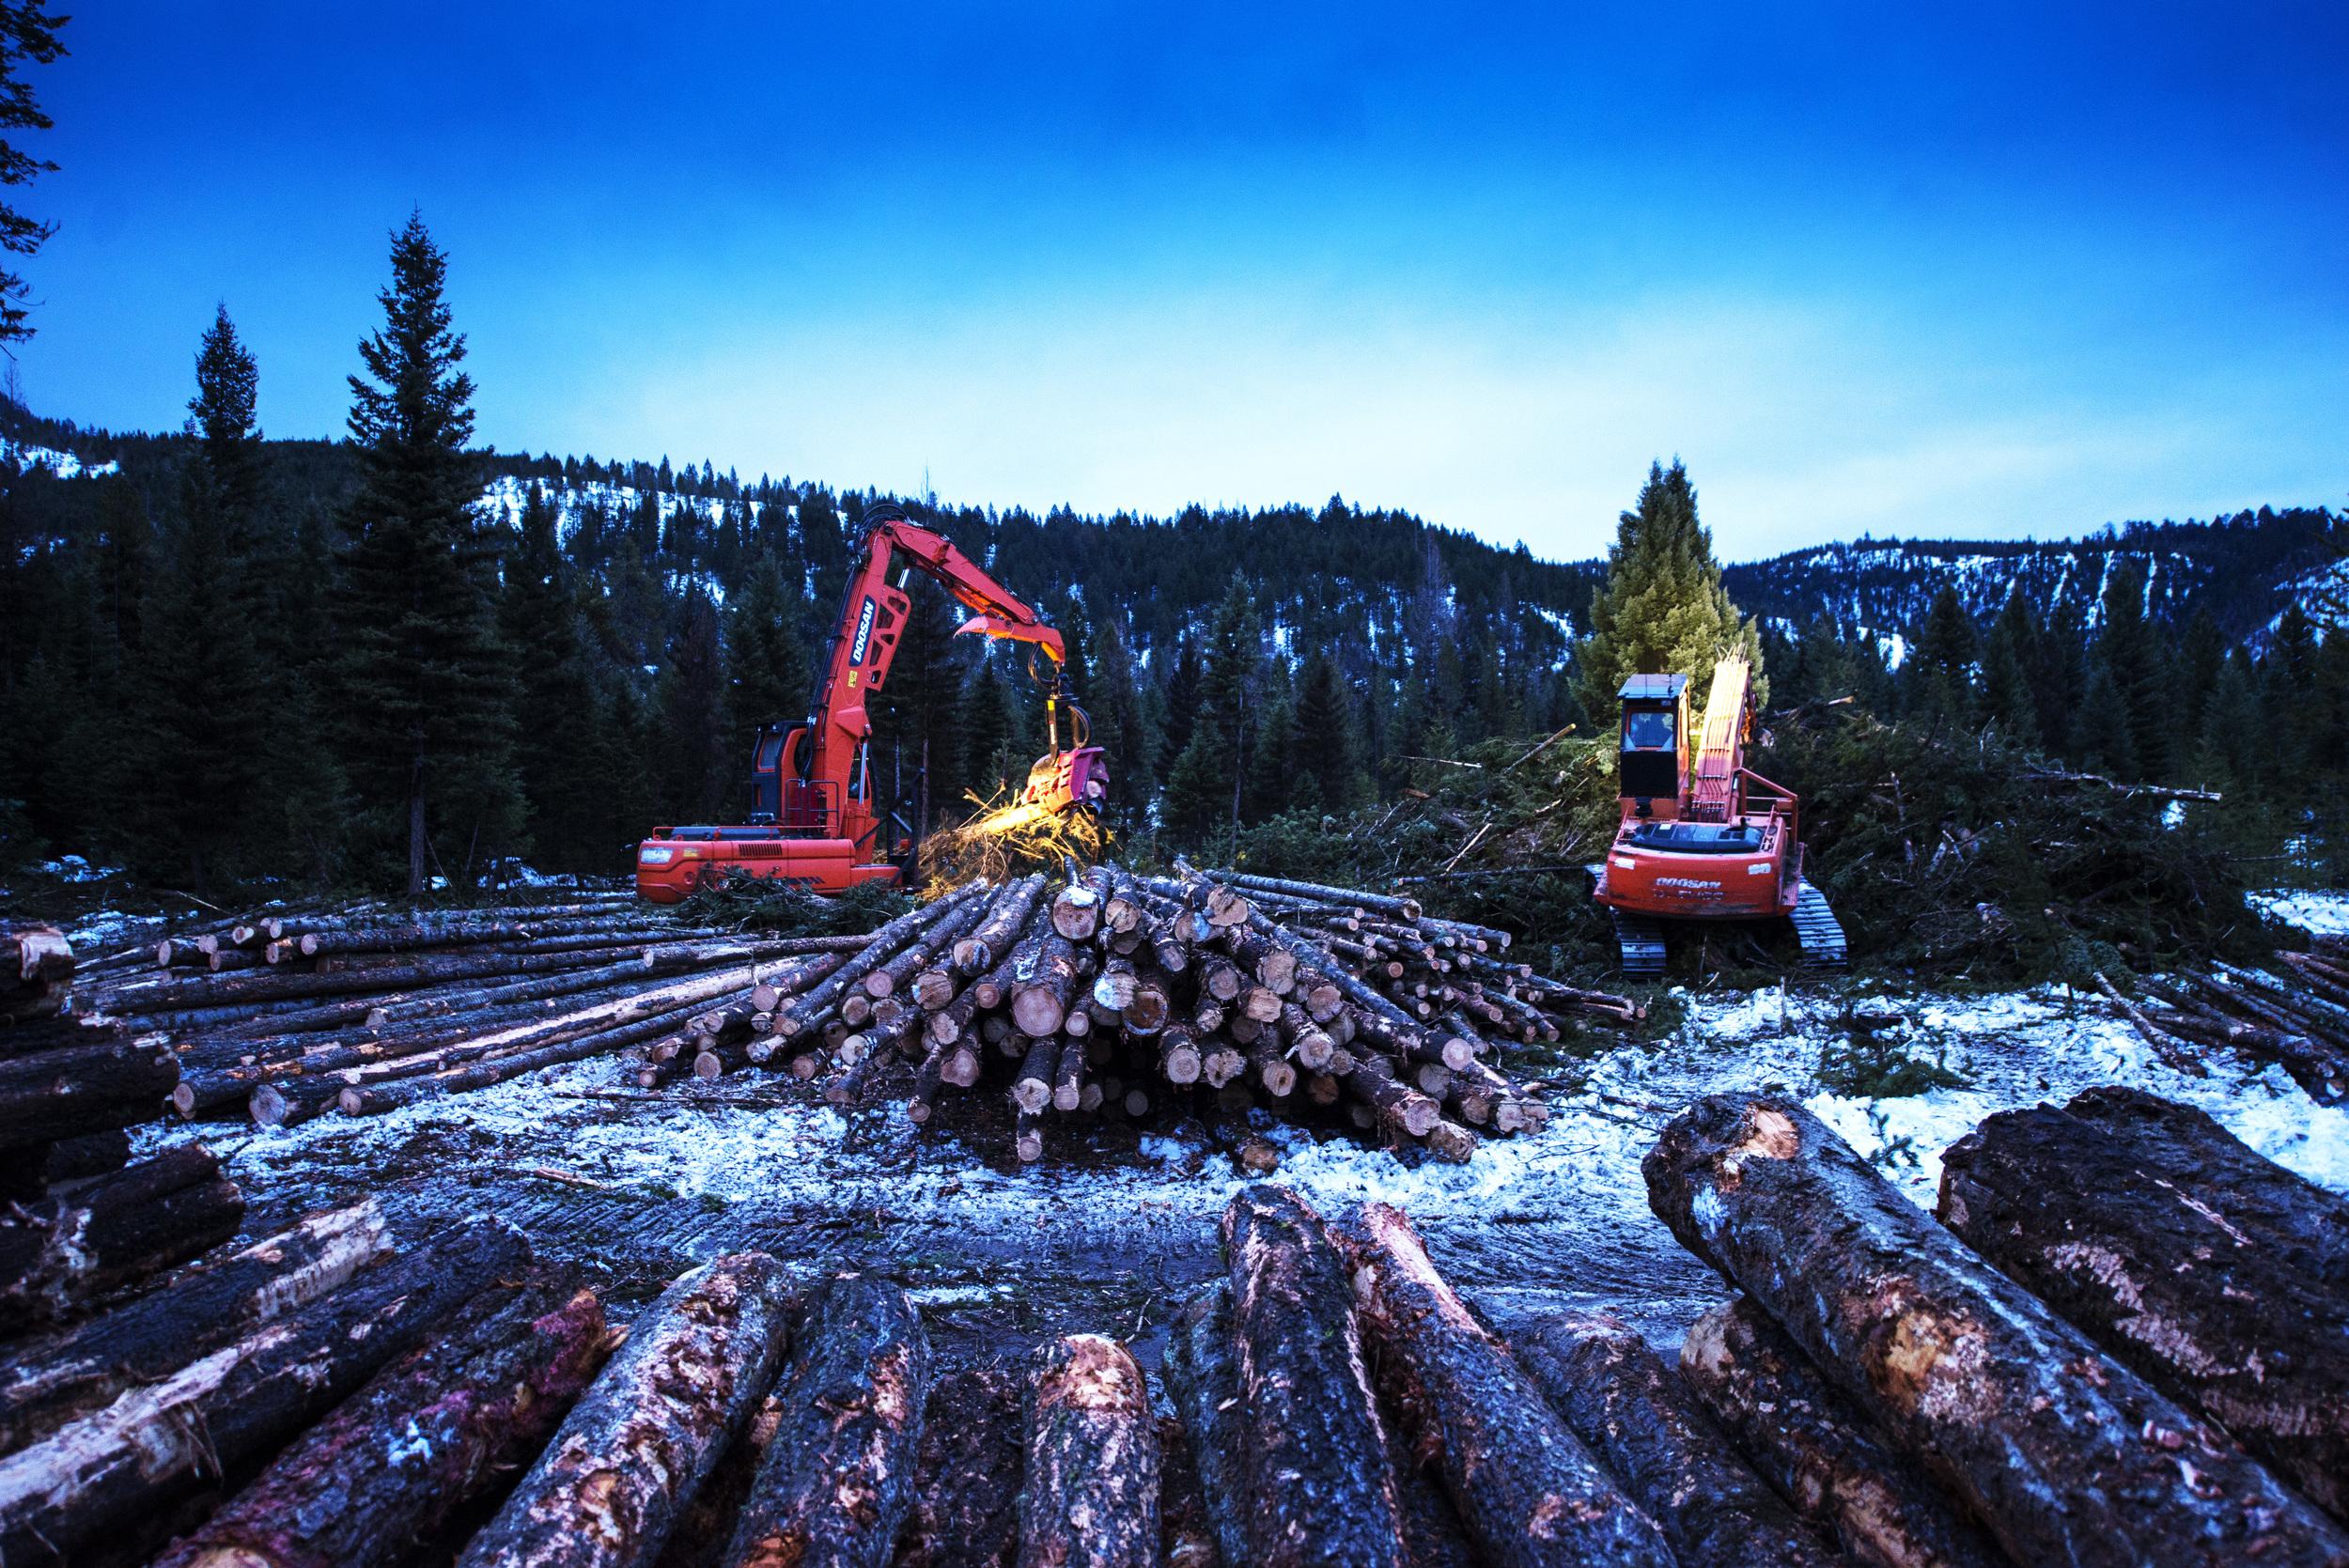 225 DX Doosan W 622C Waratah Processing Head – Operator/Owner: Mike Newton Doosan 225LL Log Loader – Operator: Todd Boehler, Employee of Newton Logging, Inc.